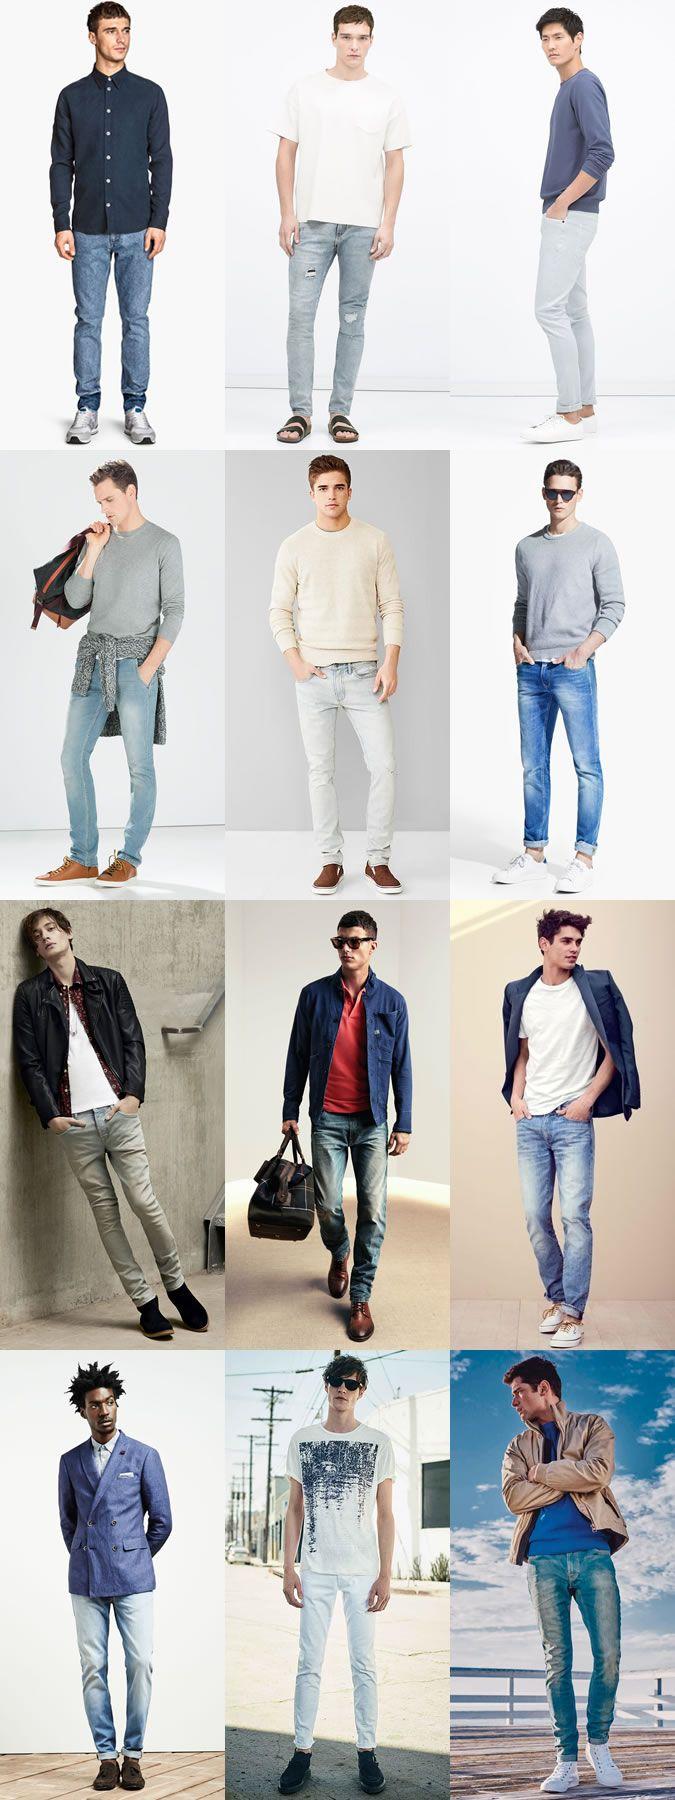 Mens Light Wash Denim Jeans Outfit Inspiration Lookbook ...